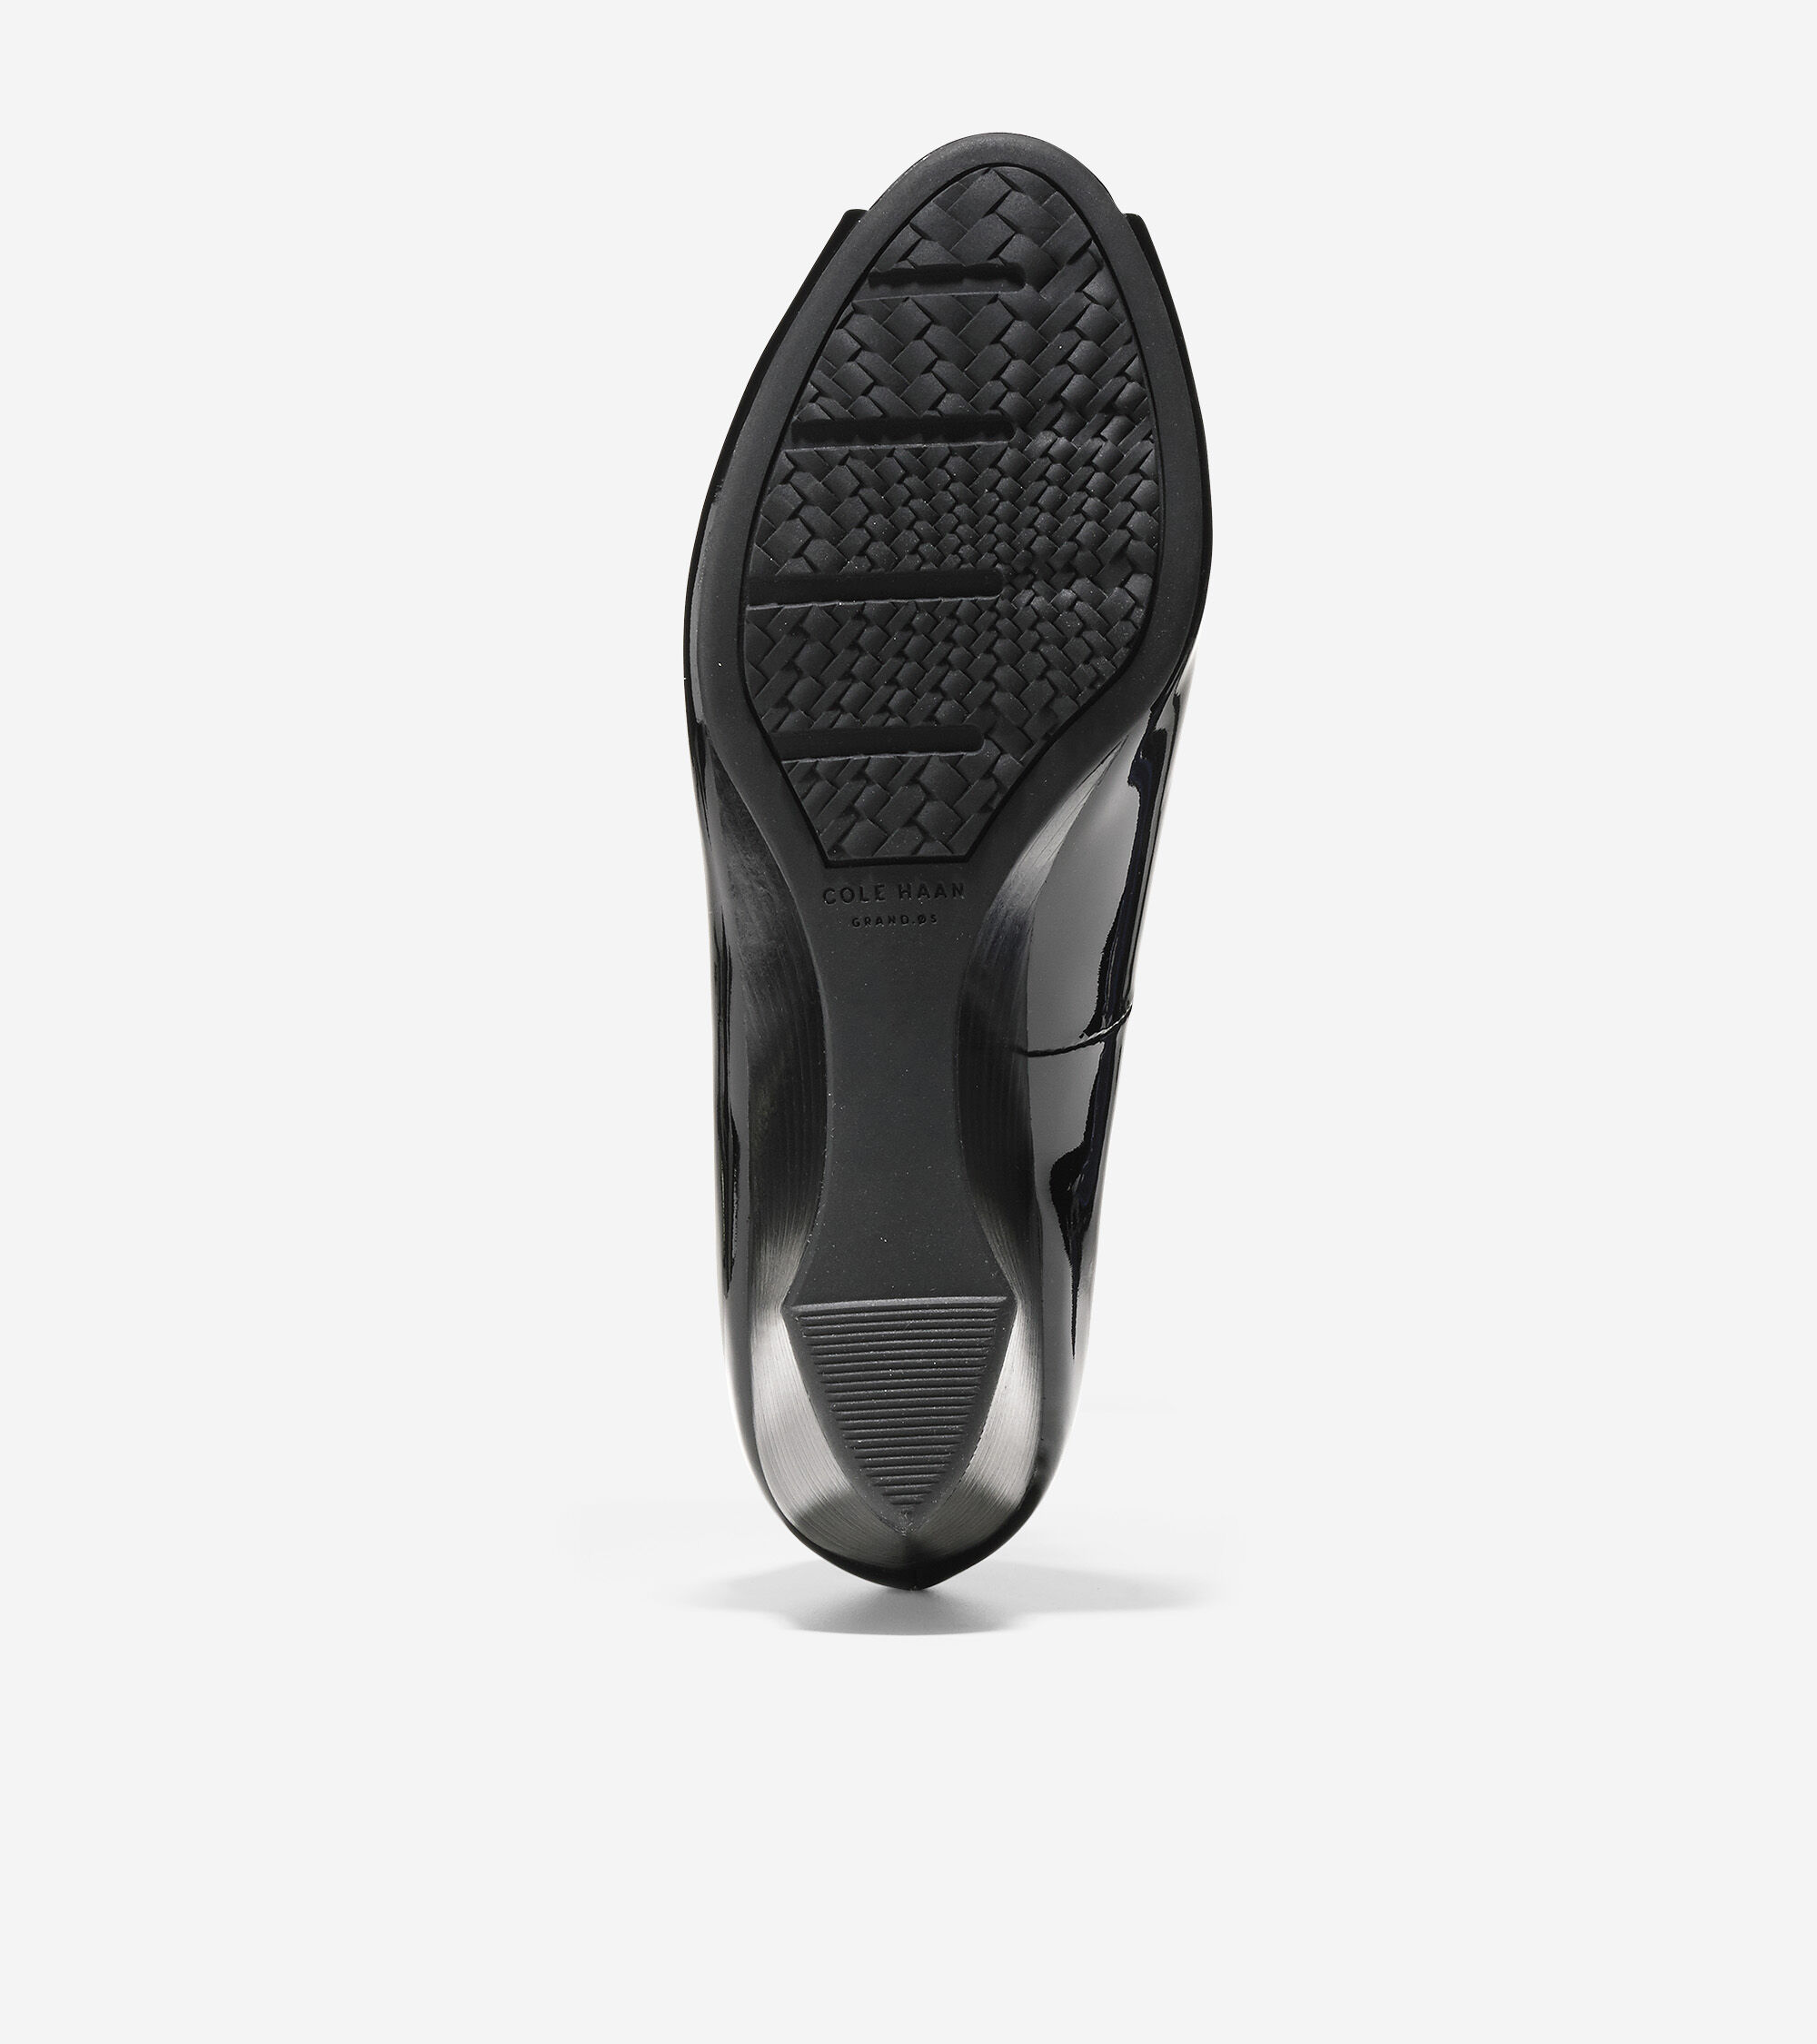 27b365e1f40 Women s Sadie Open Toe Wedges 65mm in Black